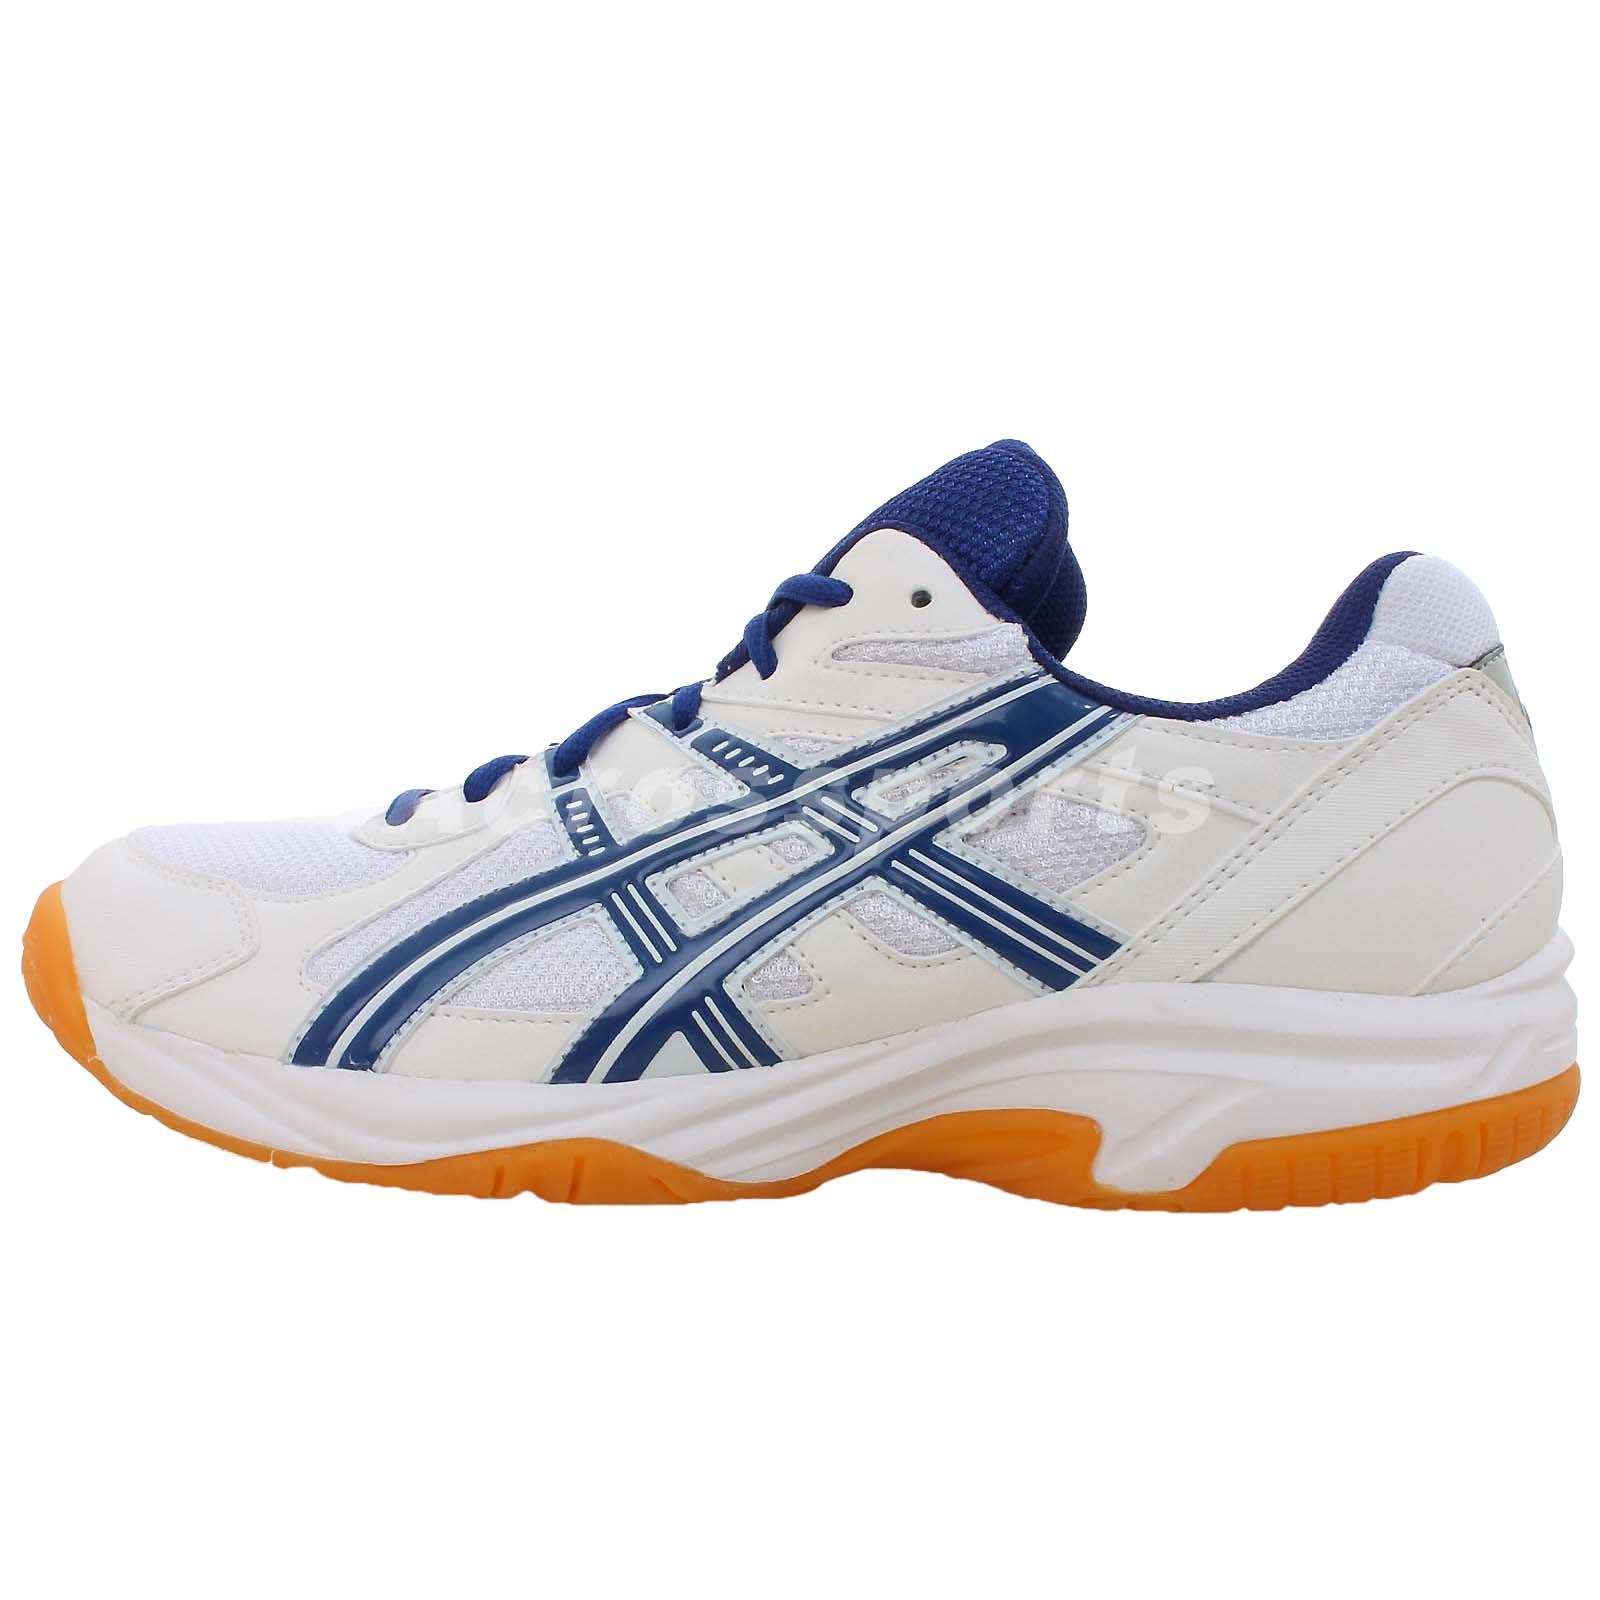 asics geldoha 2013 mens badminton volleyball shoes gum